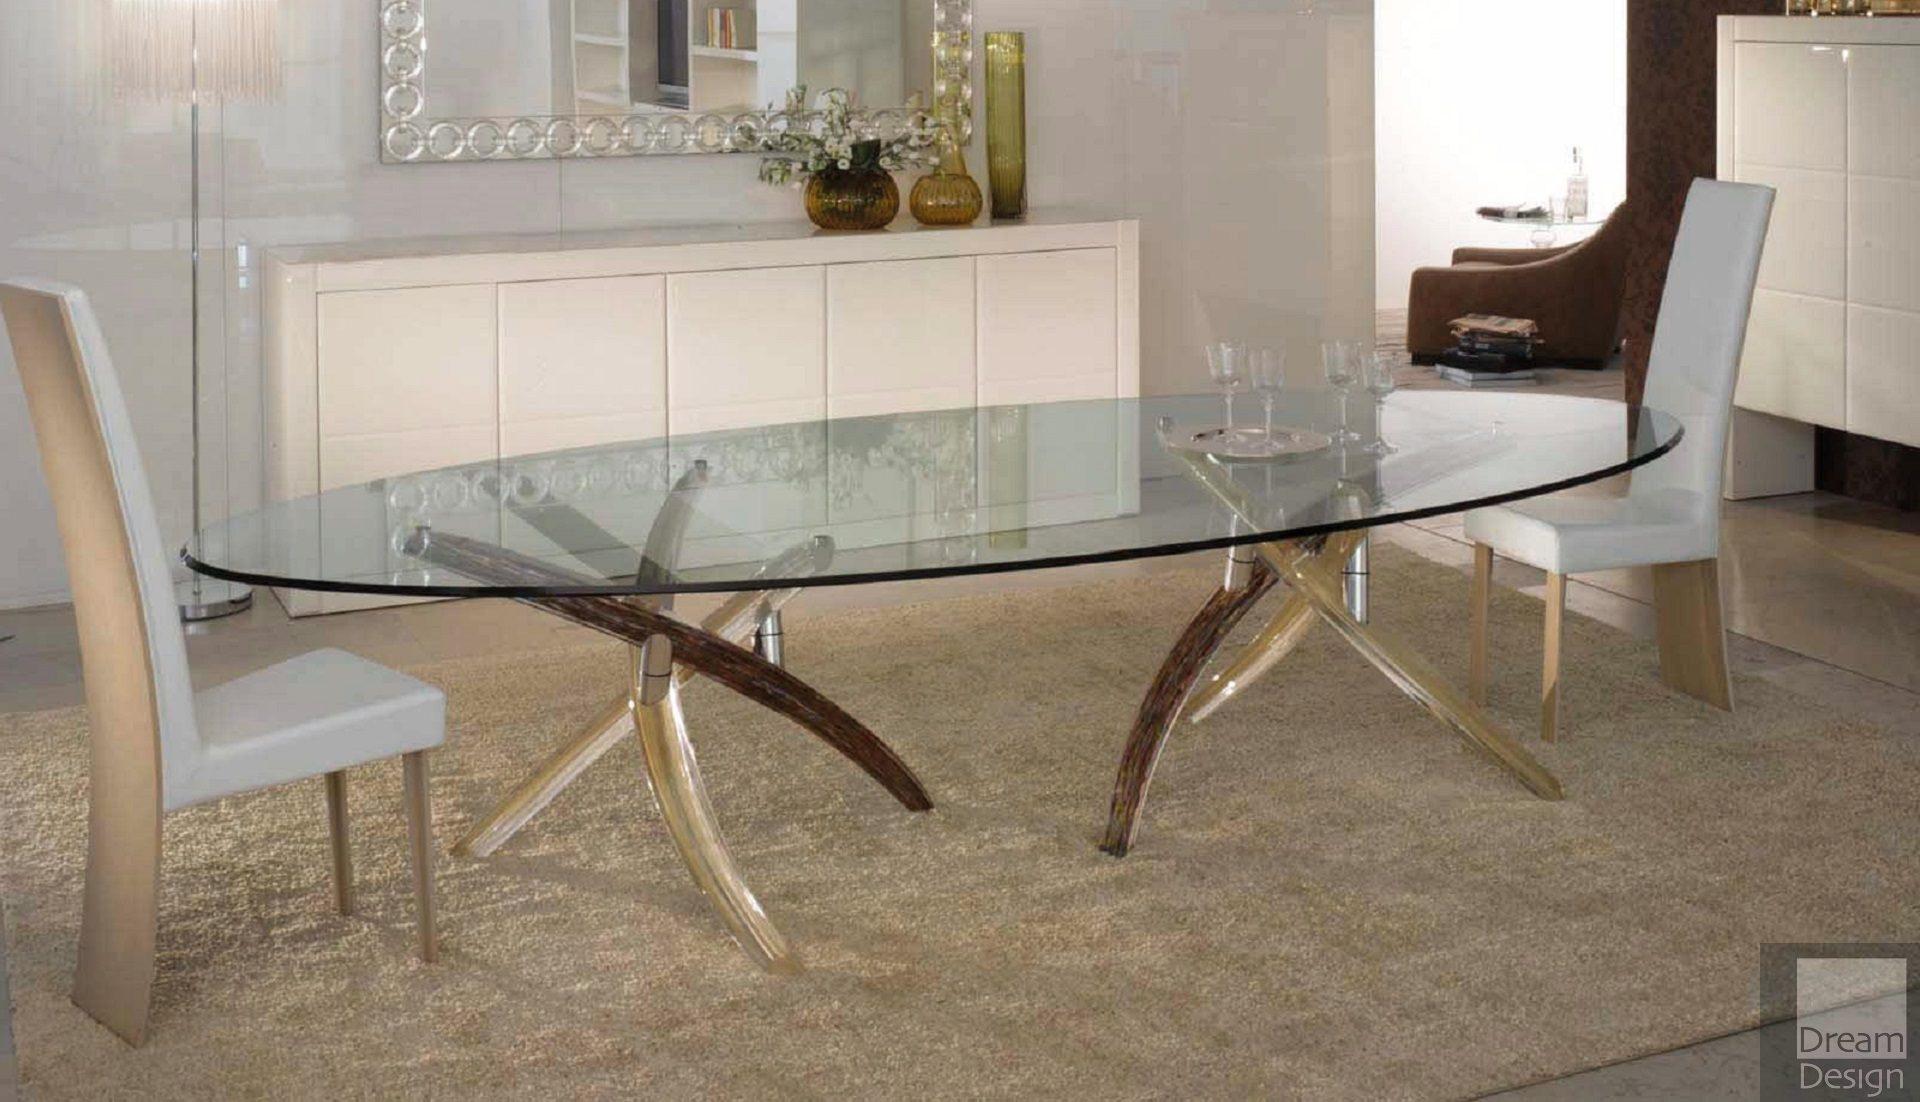 Reflex Angelo Fili D'erba Two Base Oval Table